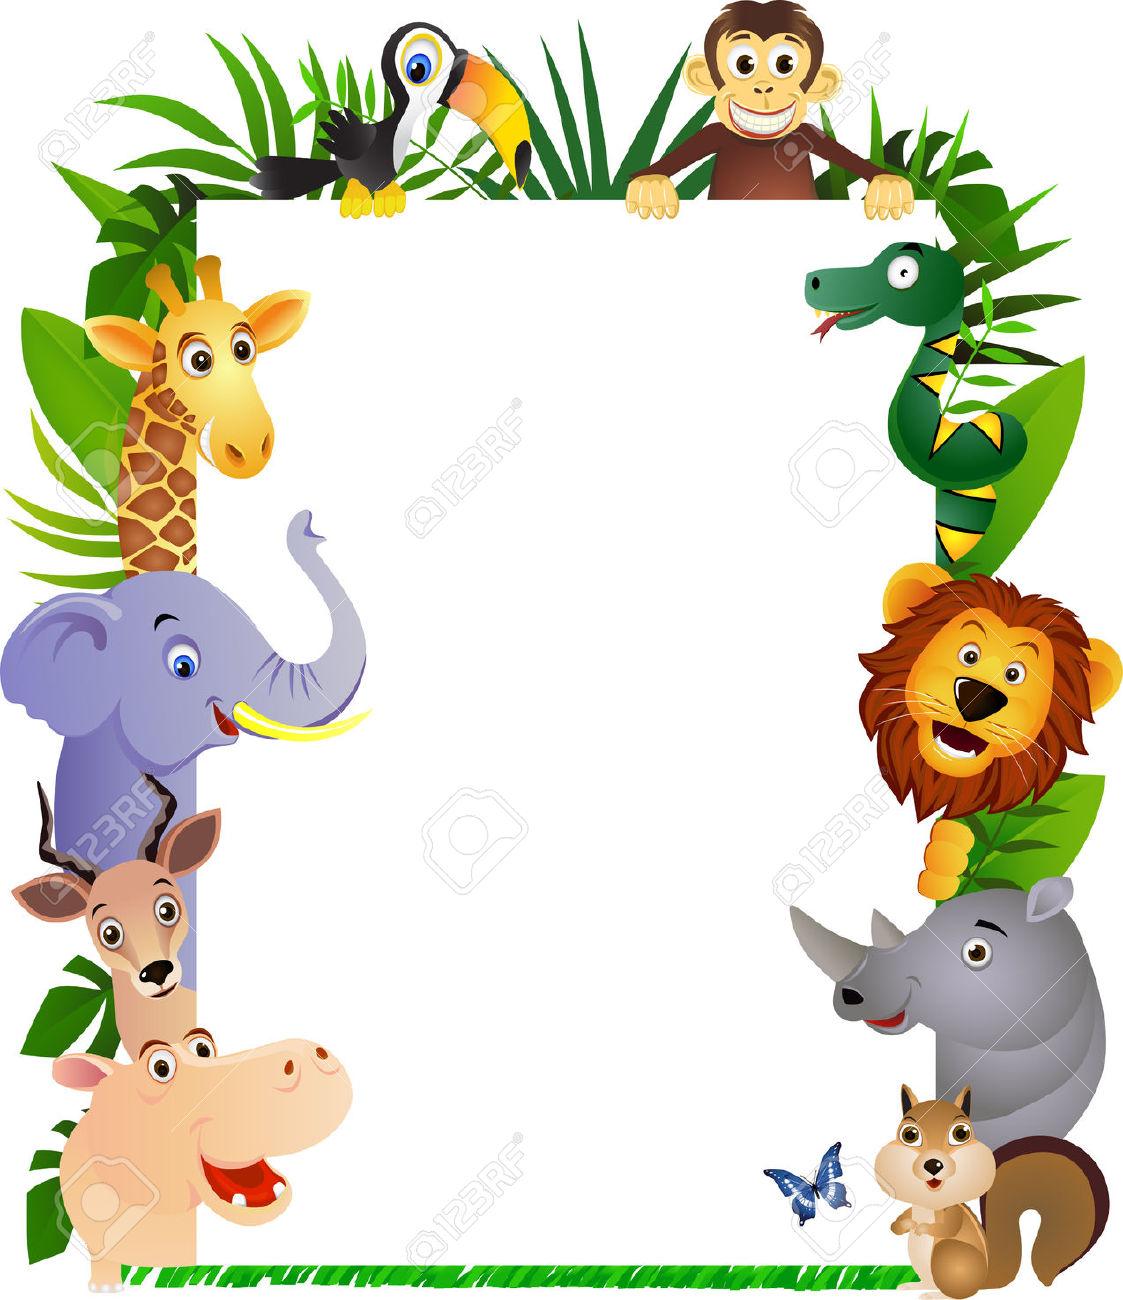 Safari clipart cartoon Frame 6765986 animal cartoon animals